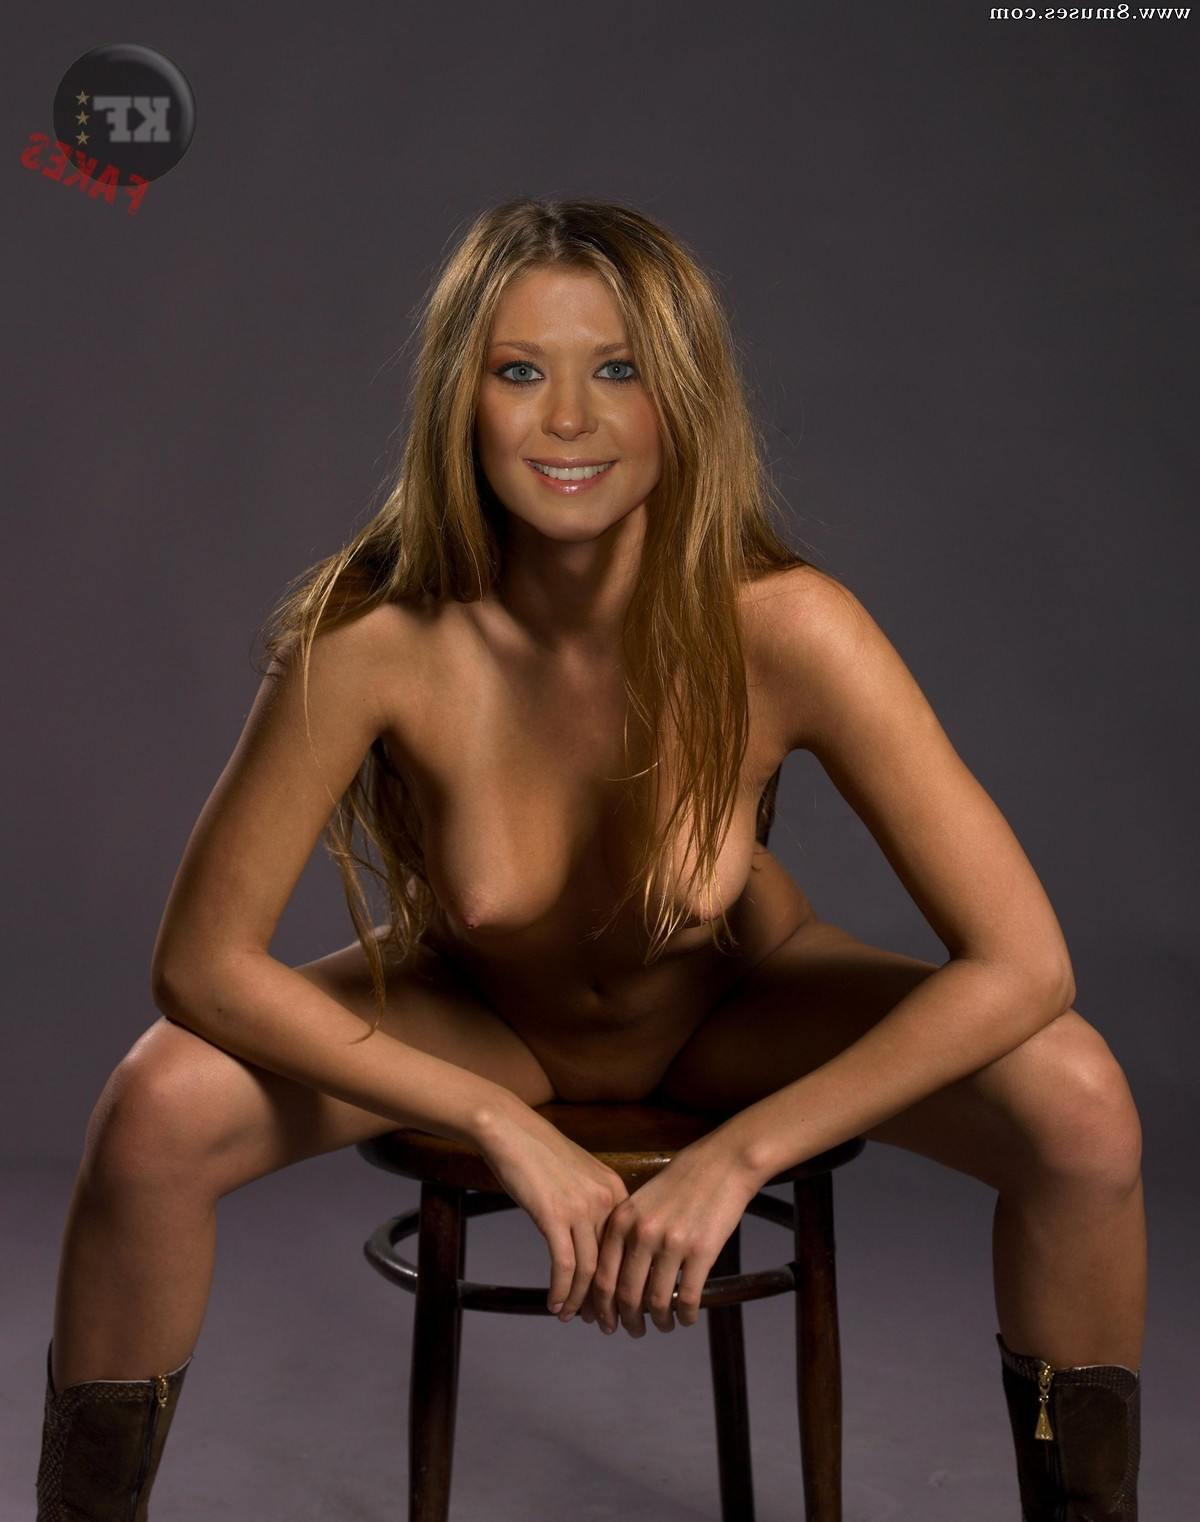 Fake-Celebrities-Sex-Pictures/Tara-Reid Tara_Reid__8muses_-_Sex_and_Porn_Comics_86.jpg